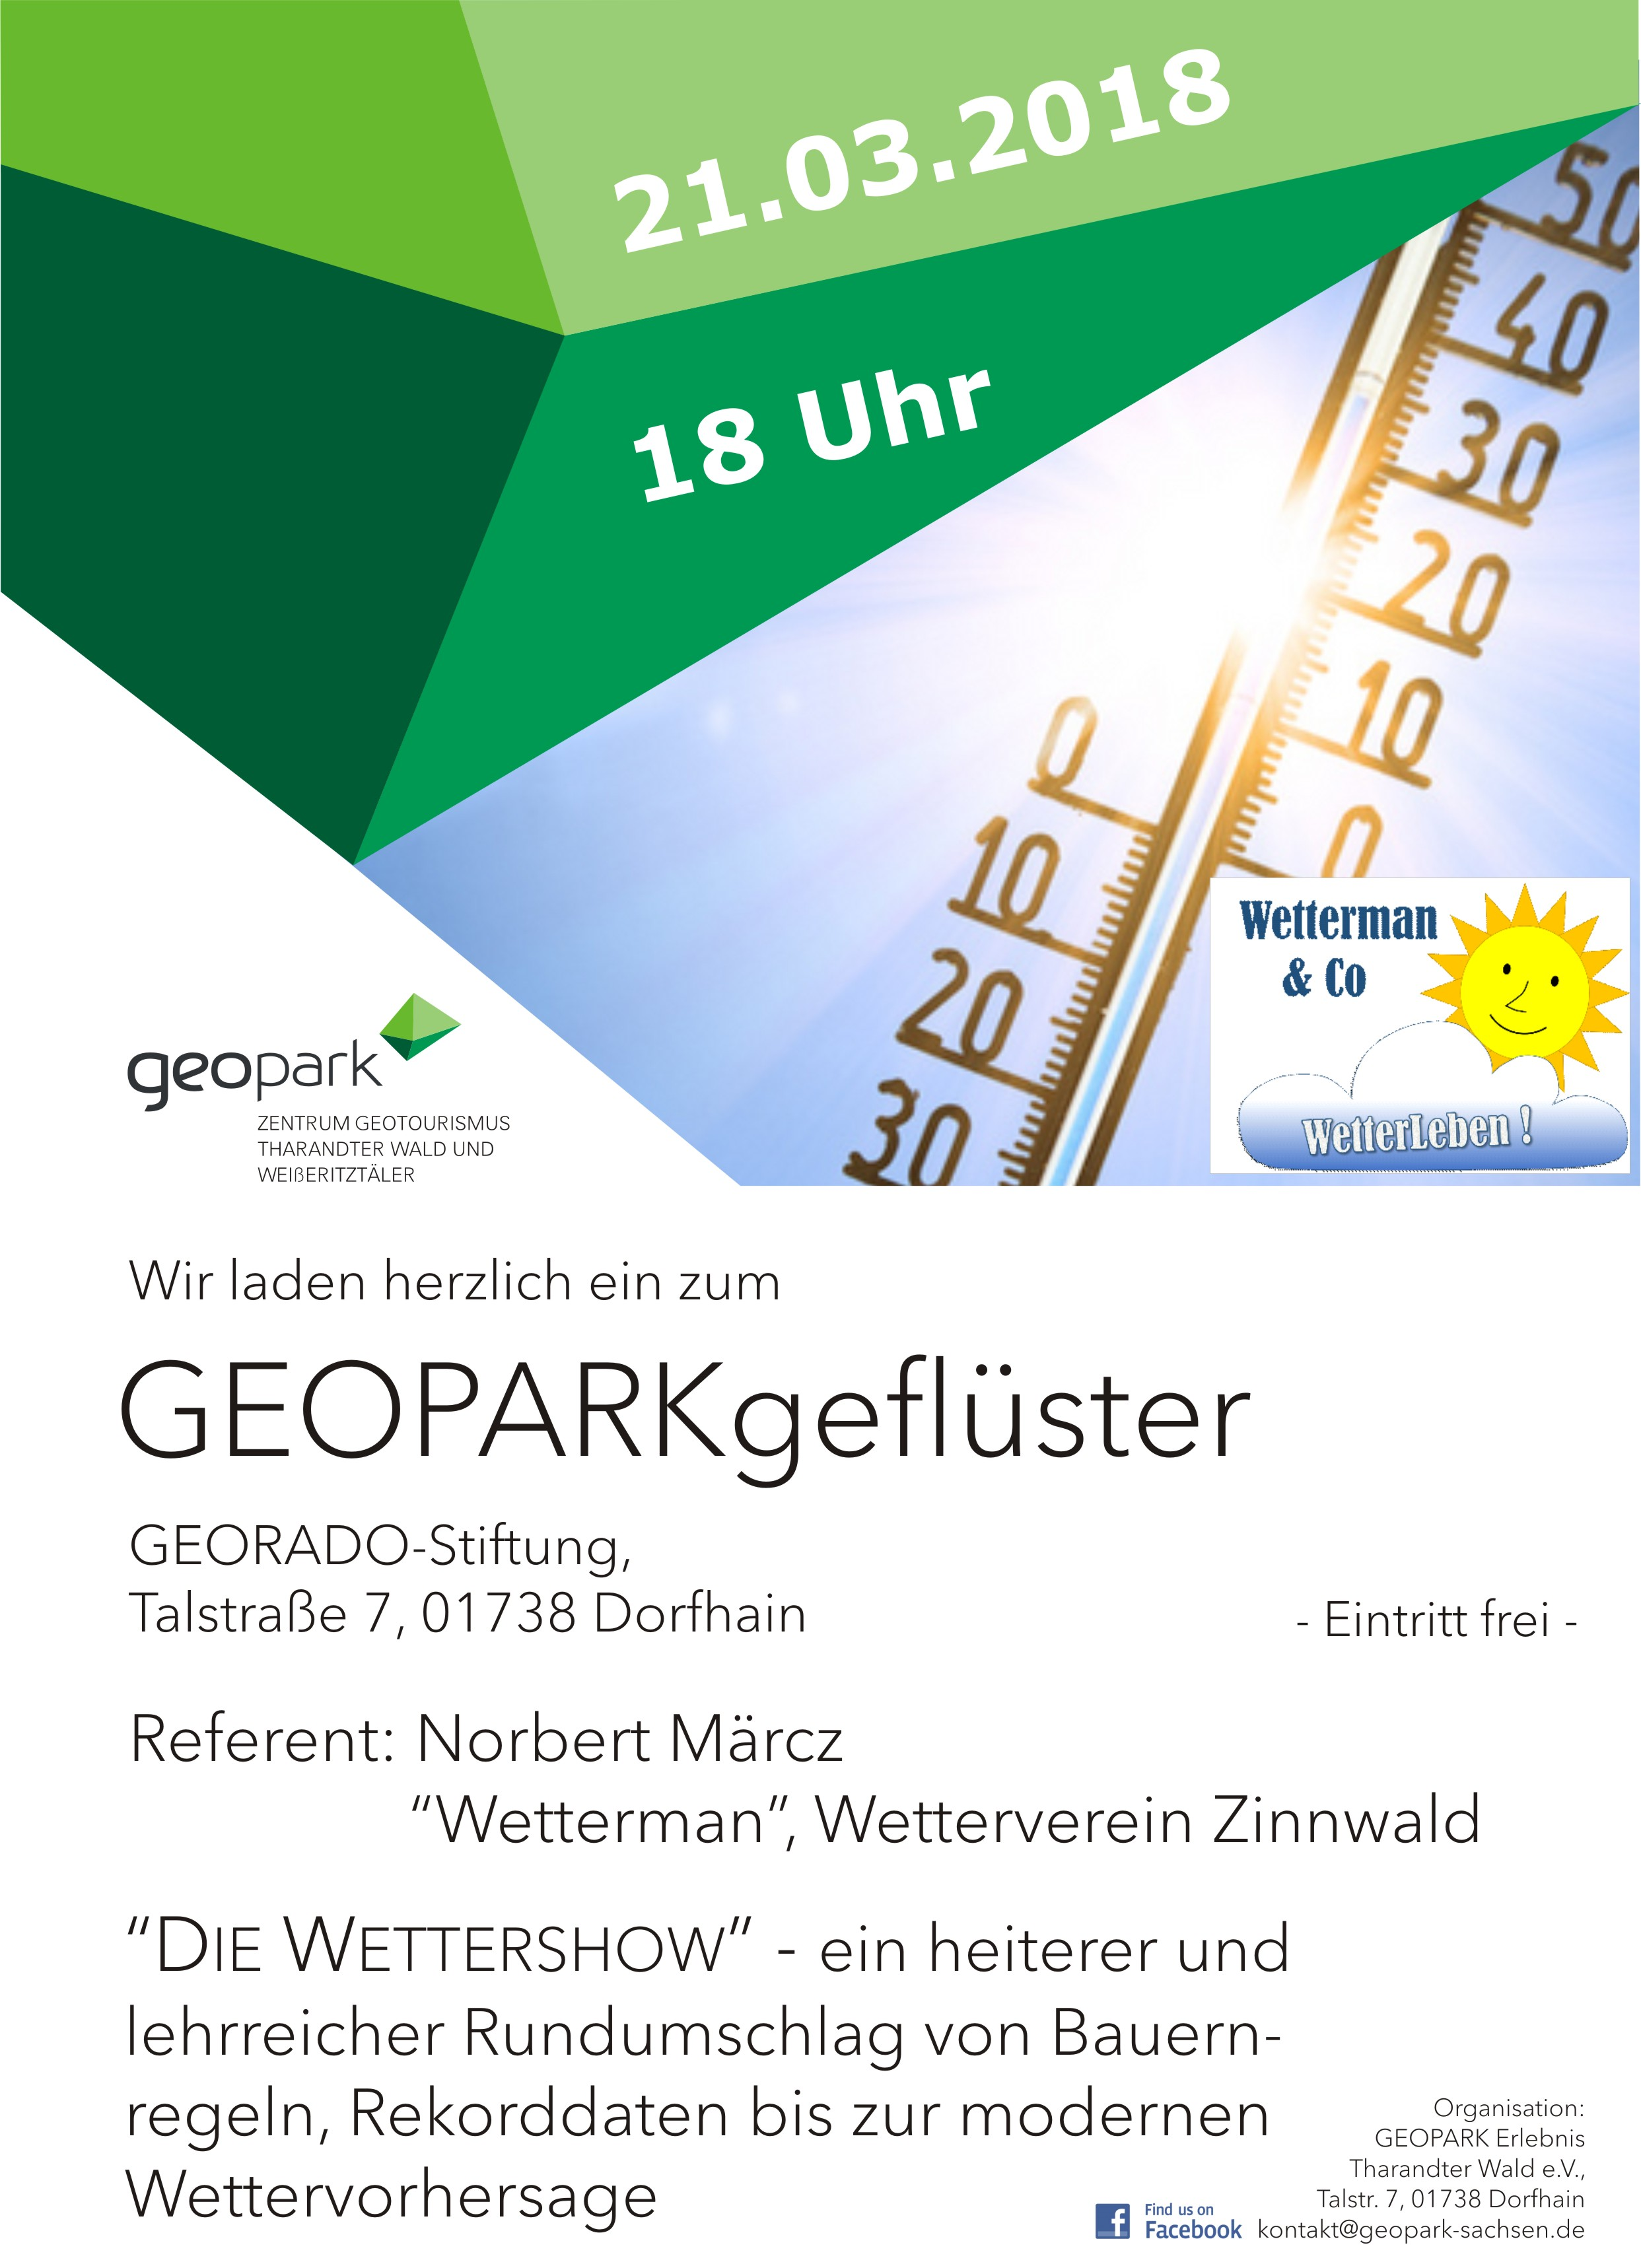 2018-03-21_A4_Wettershow_Geopark.jpg